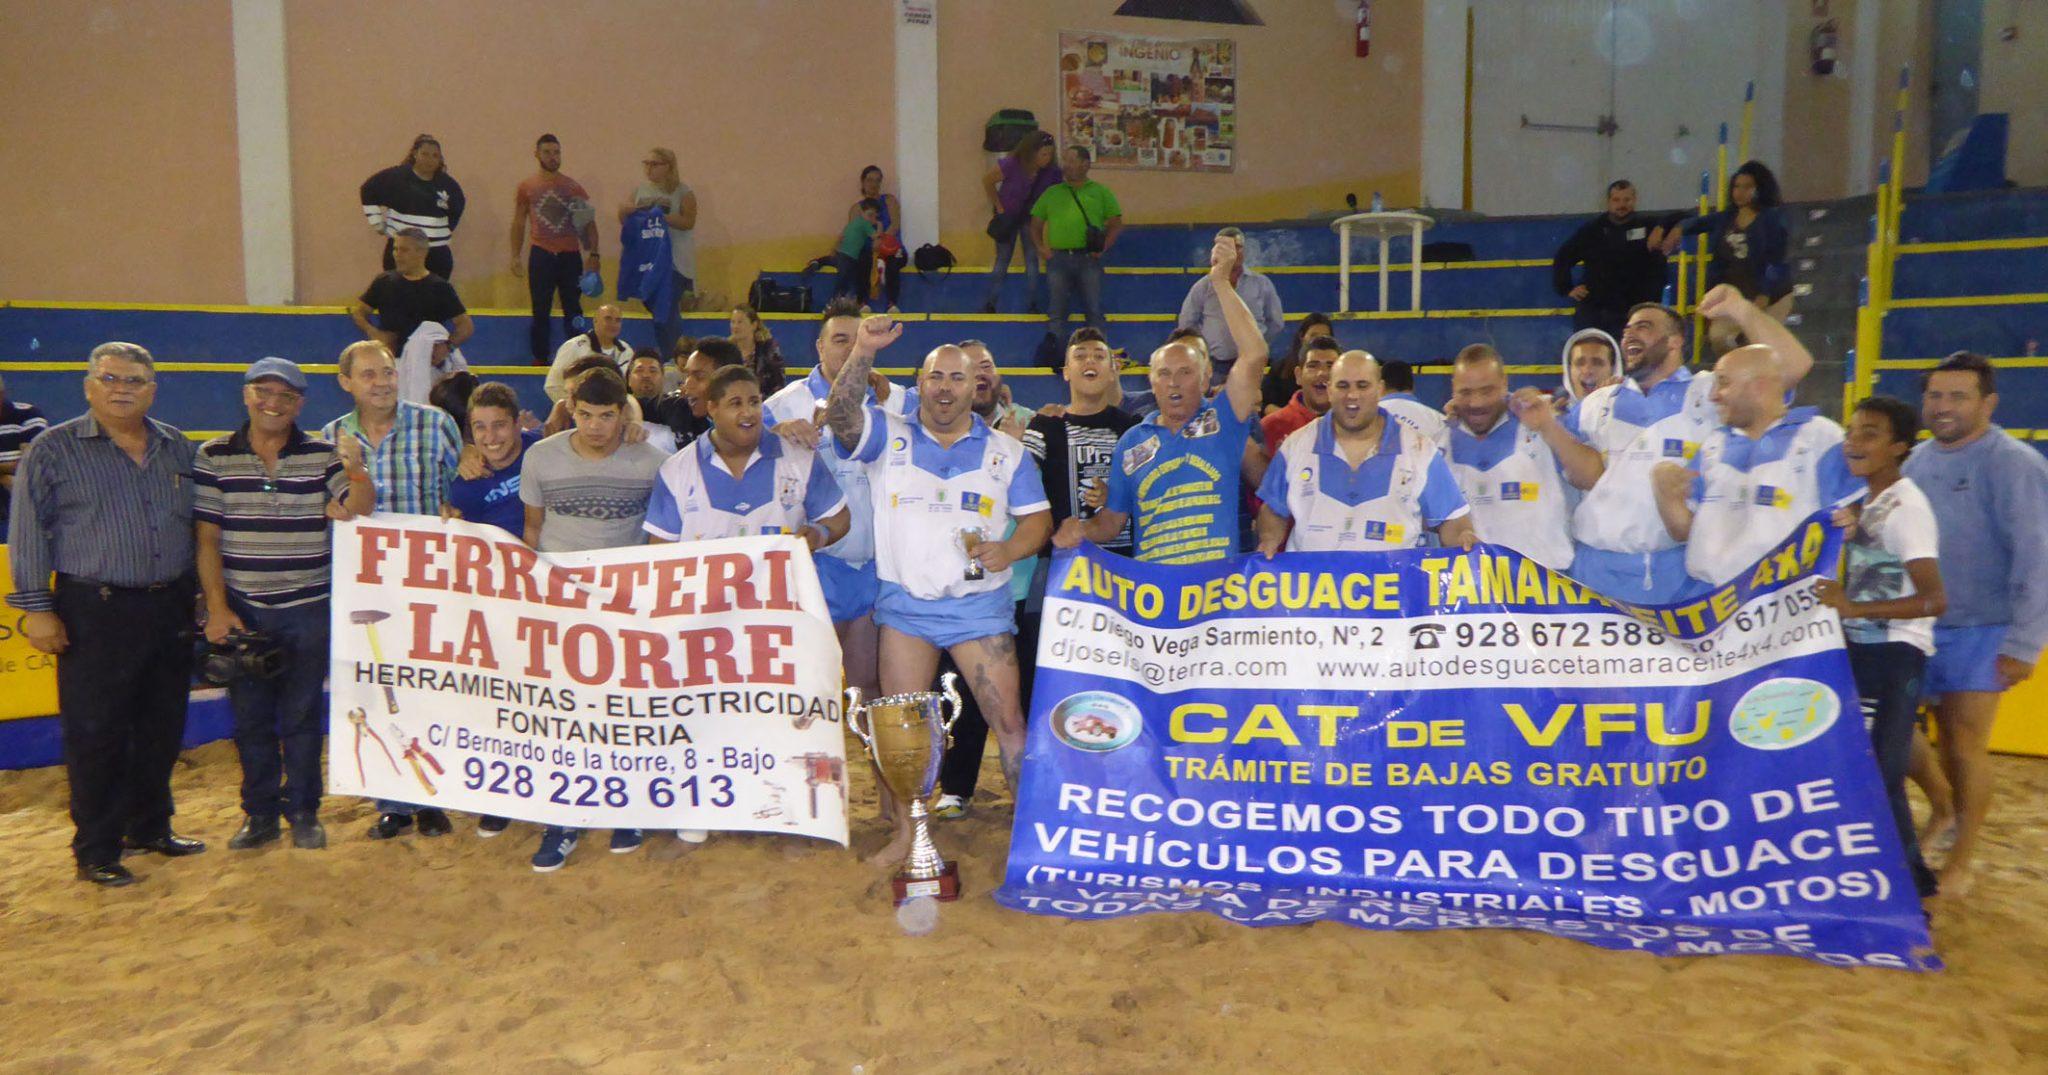 CL SANTA RITA, vencedor en Tercera Categoria de la XXXVIII Copa Fundación Obra Social La Caja de Canarias 2016